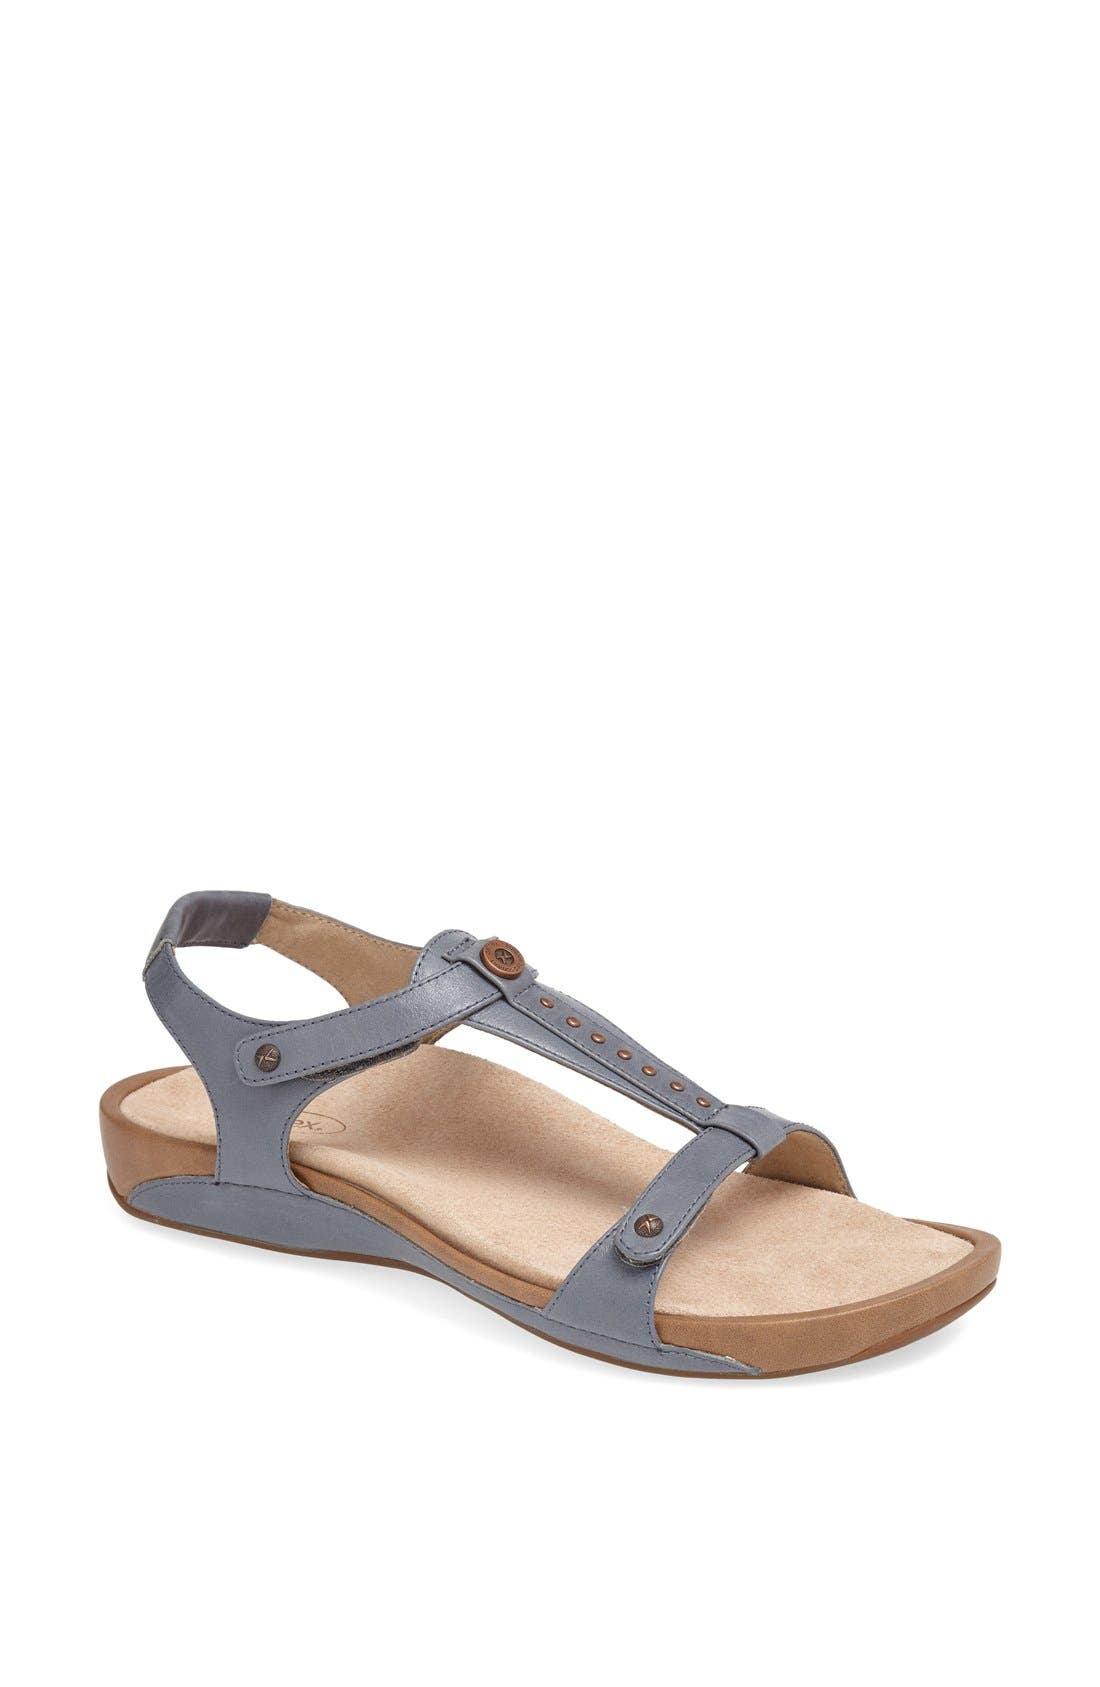 Main Image - Aetrex 'Alyssa' Leather Sandal